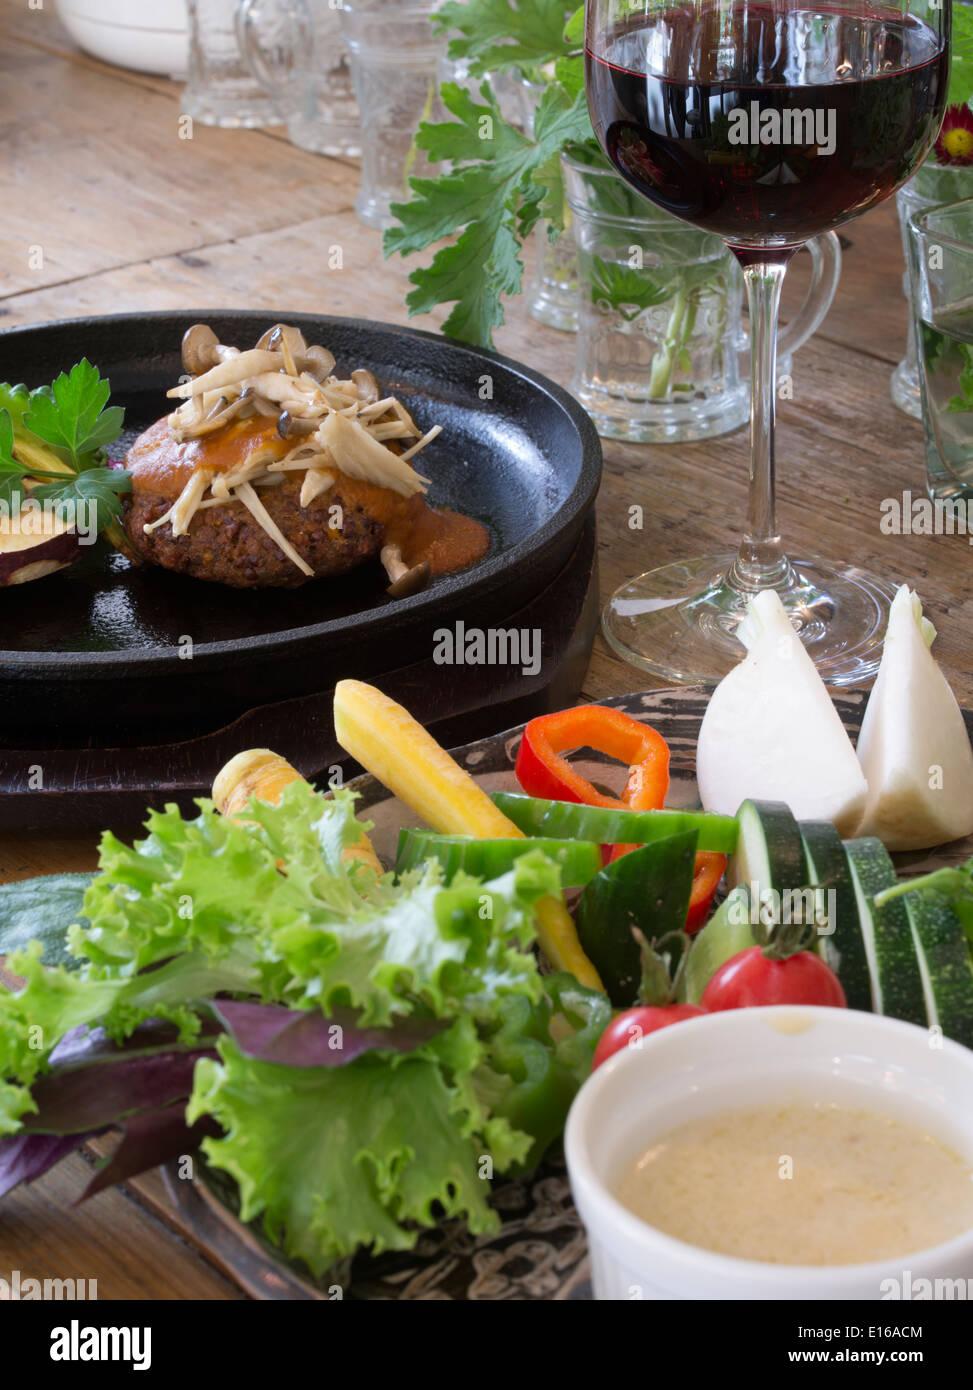 Organische, lokal angebauten Gemüse im Garten Ukishima veganes Restaurant, Naha, Okinawa Stockbild